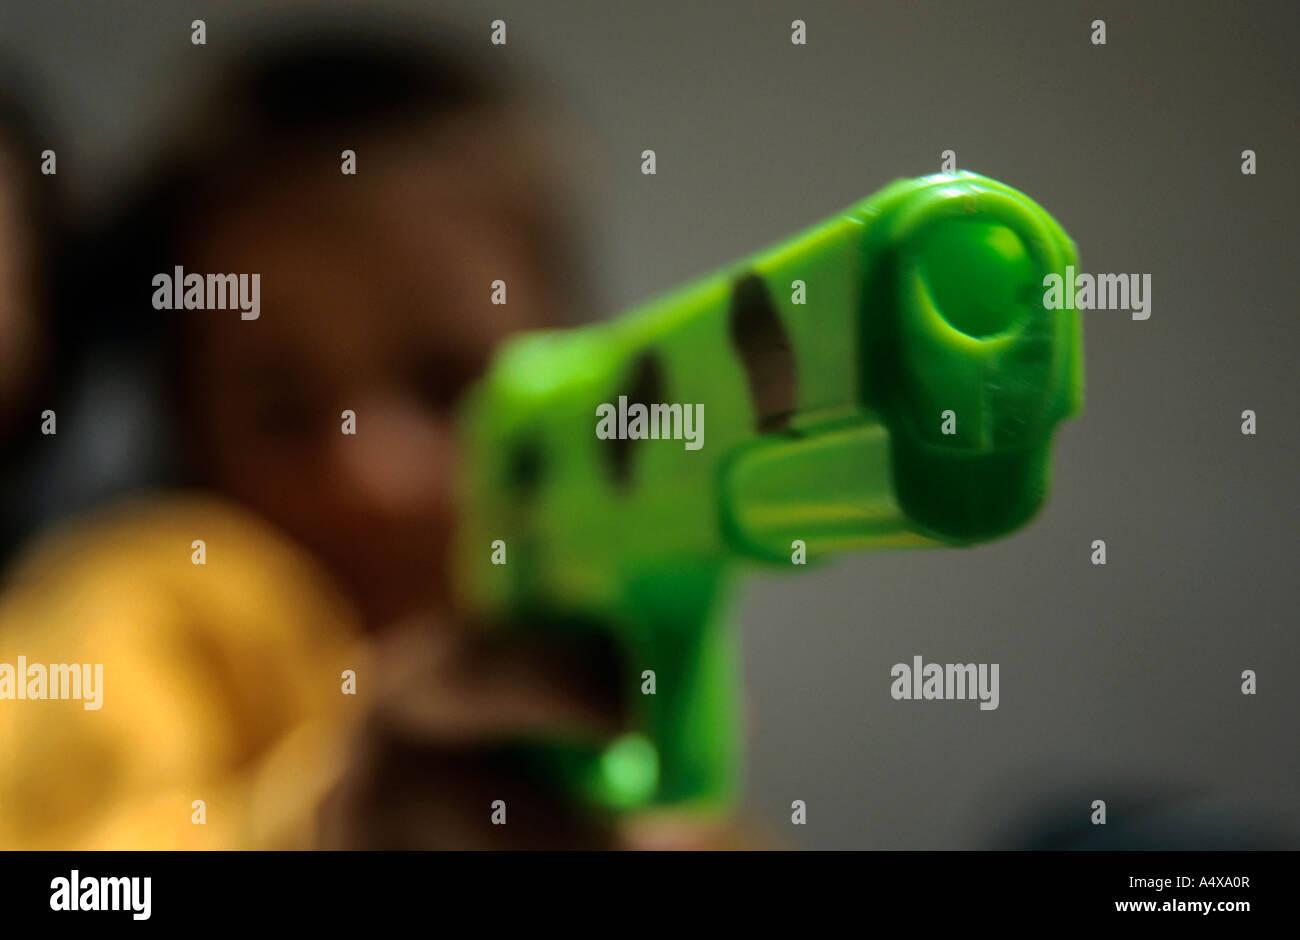 Children Holding A Gun Stock Photo